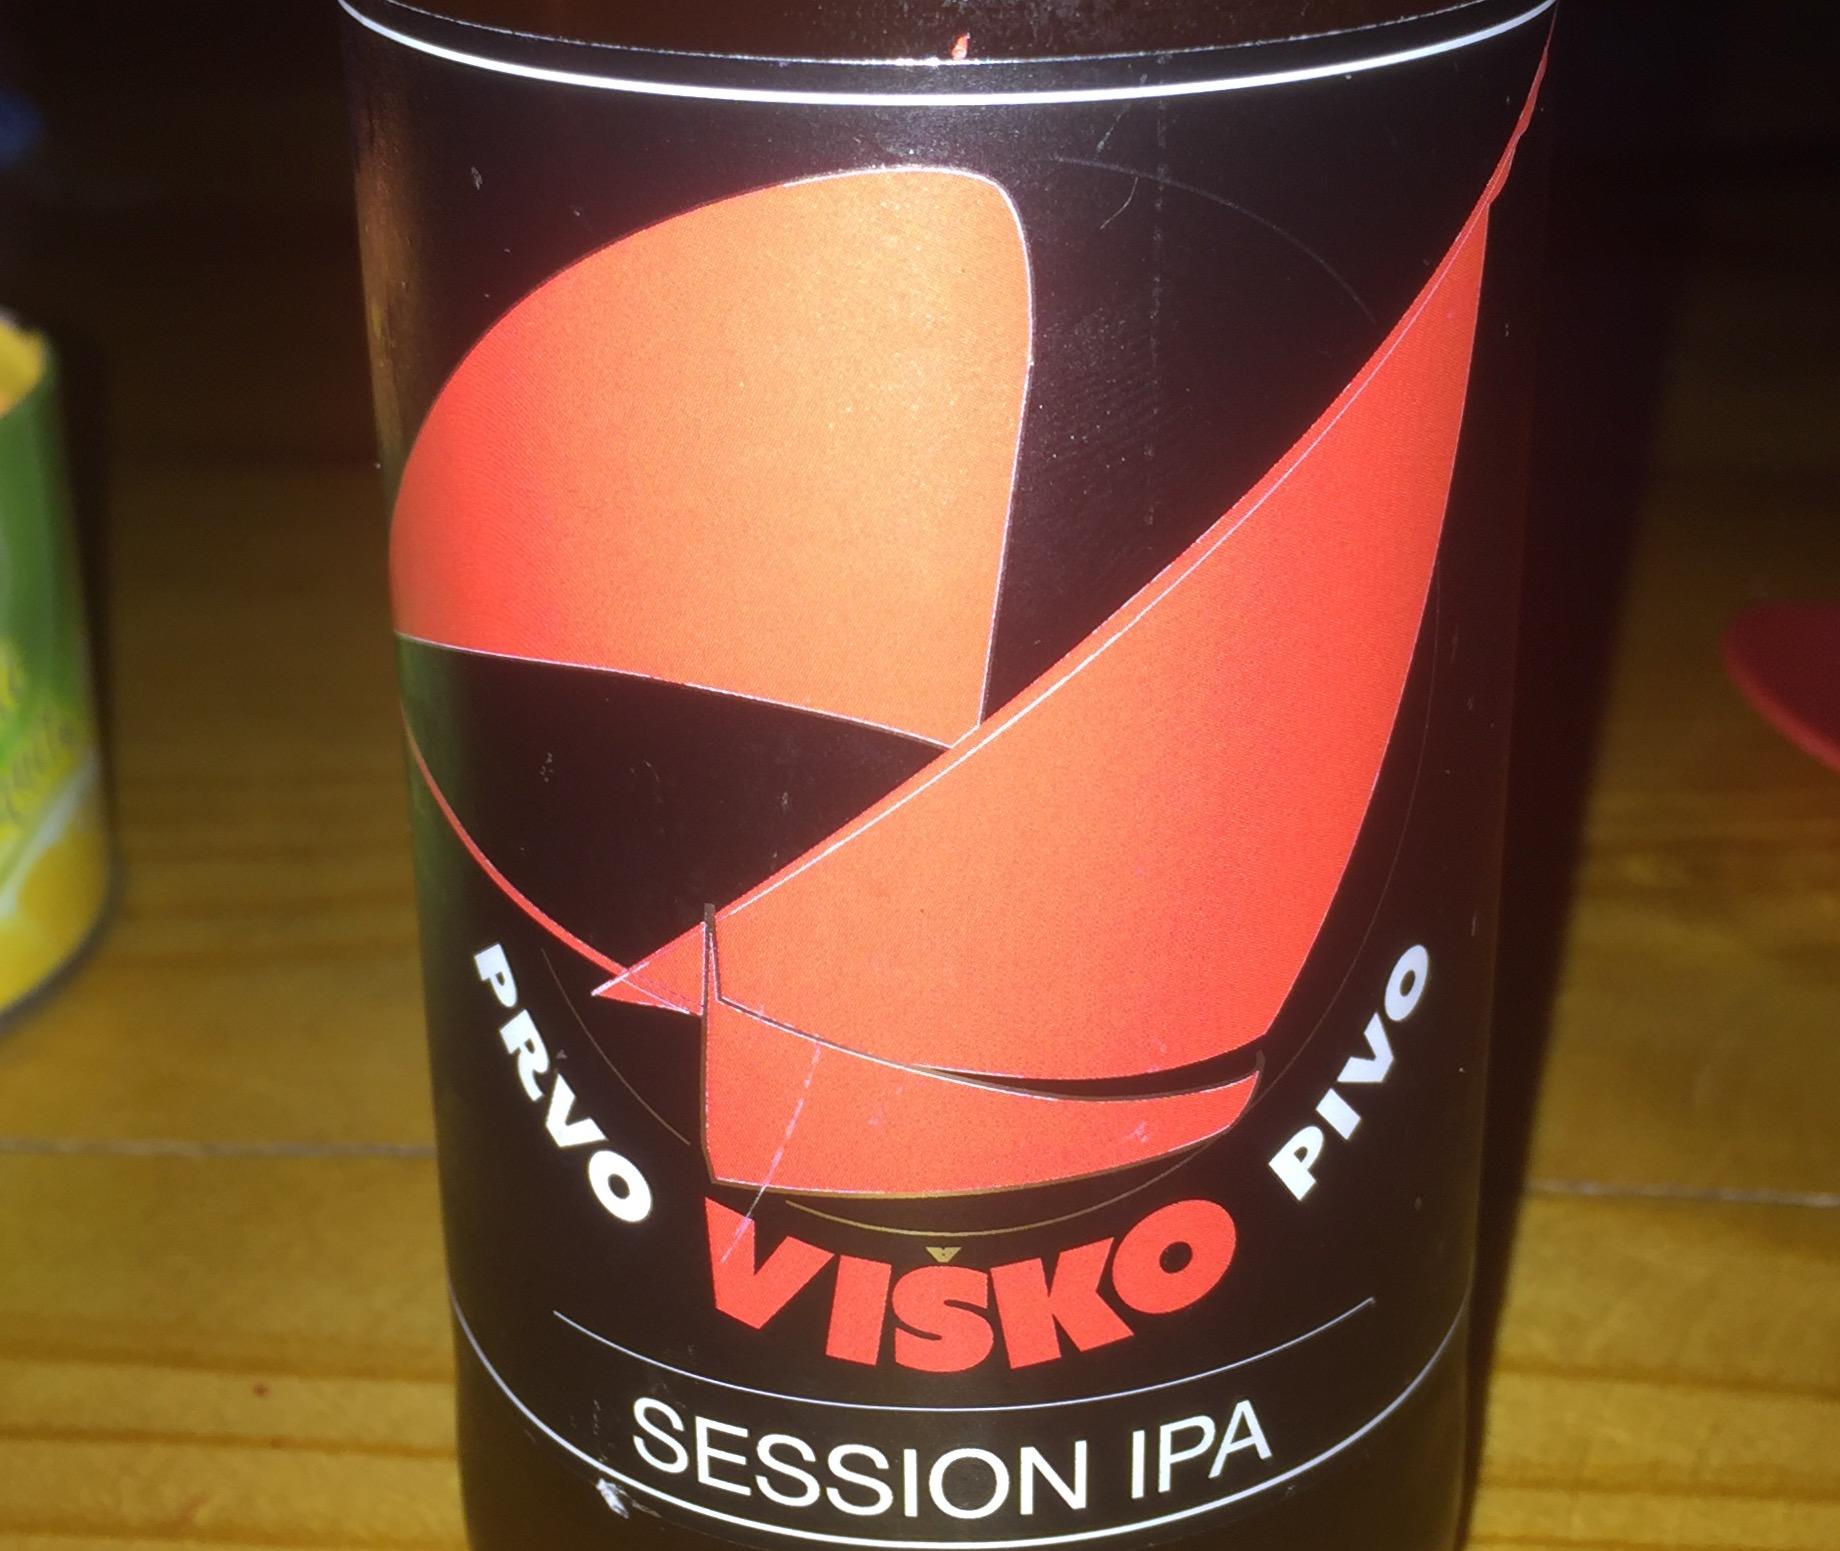 Prvo Visko Pivo - Session IPA